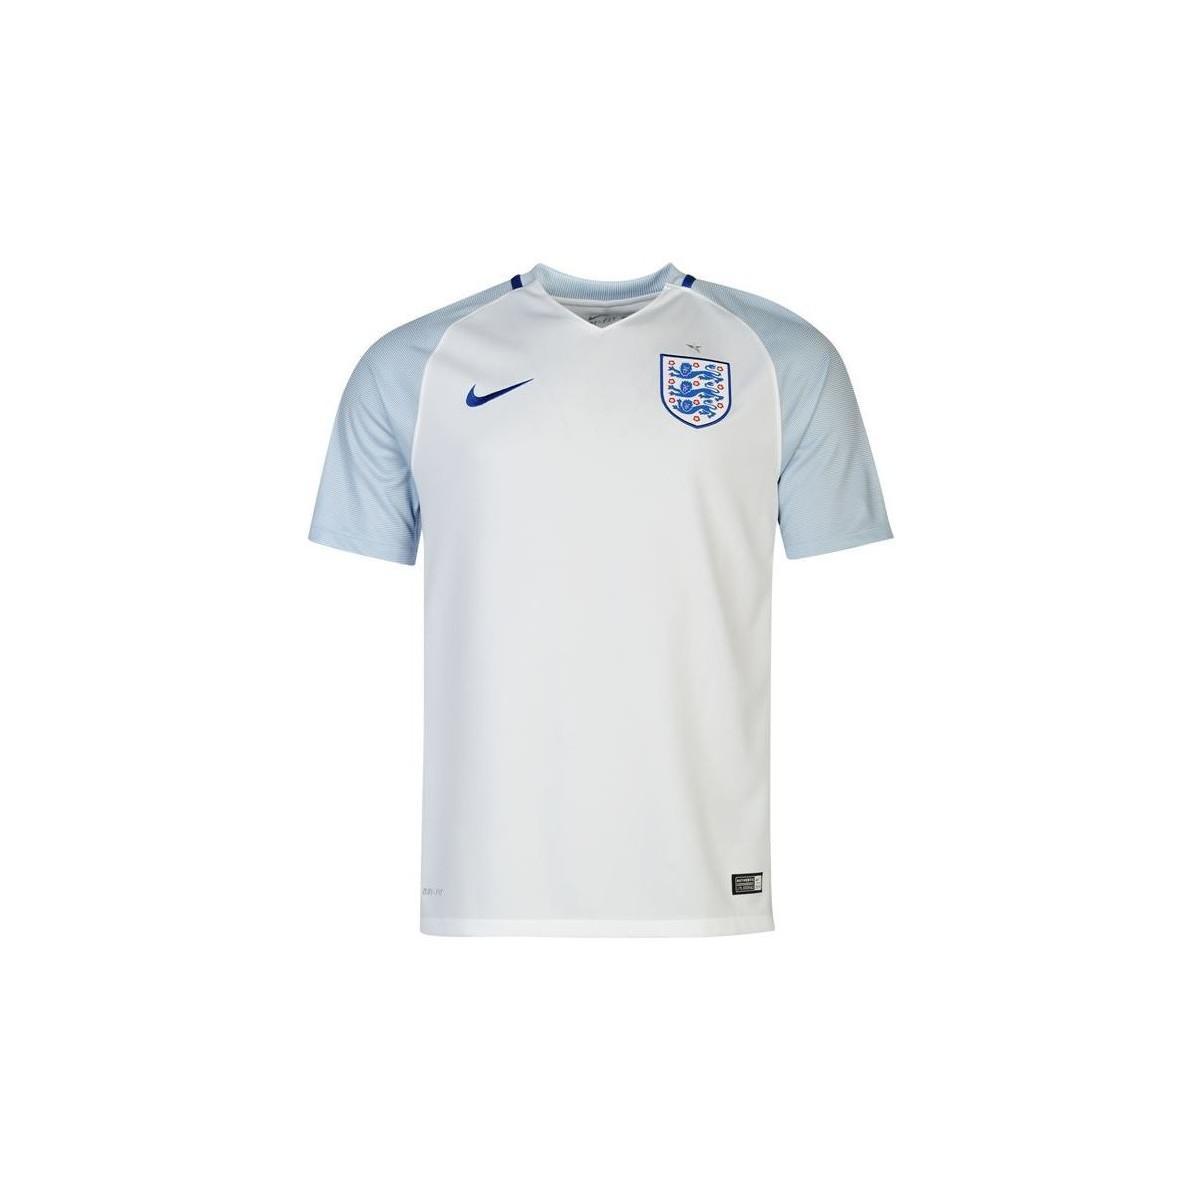 cc9435957 Nike - 2016-17 England Home Shirt (terry 6) - Kids Women s T. View  fullscreen